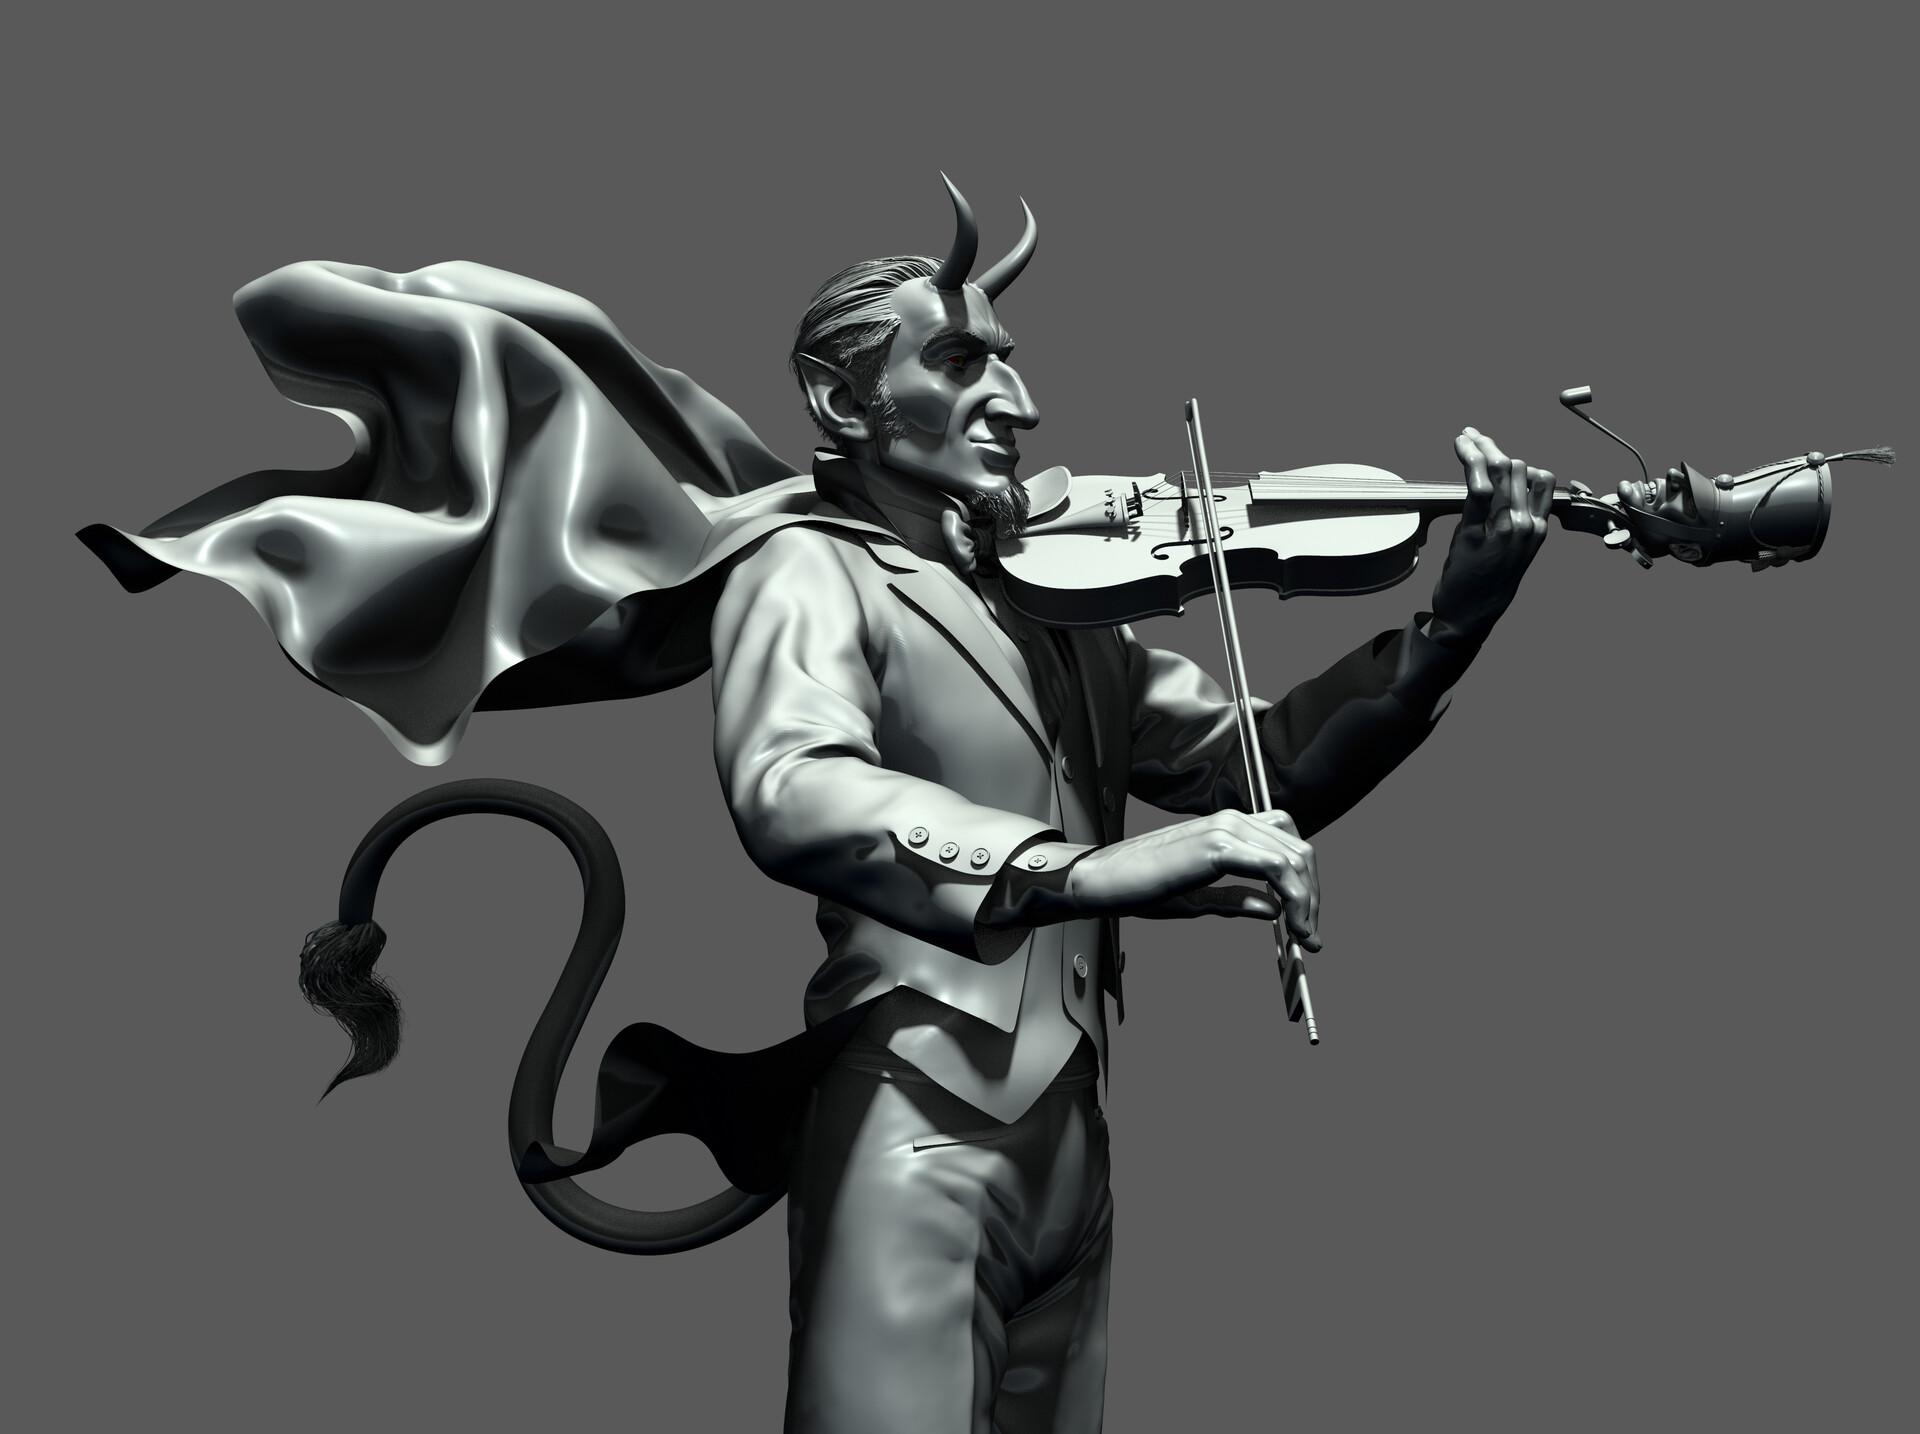 ArtStation - Devil plays on a Soldier-headed violin, István Ábrahám